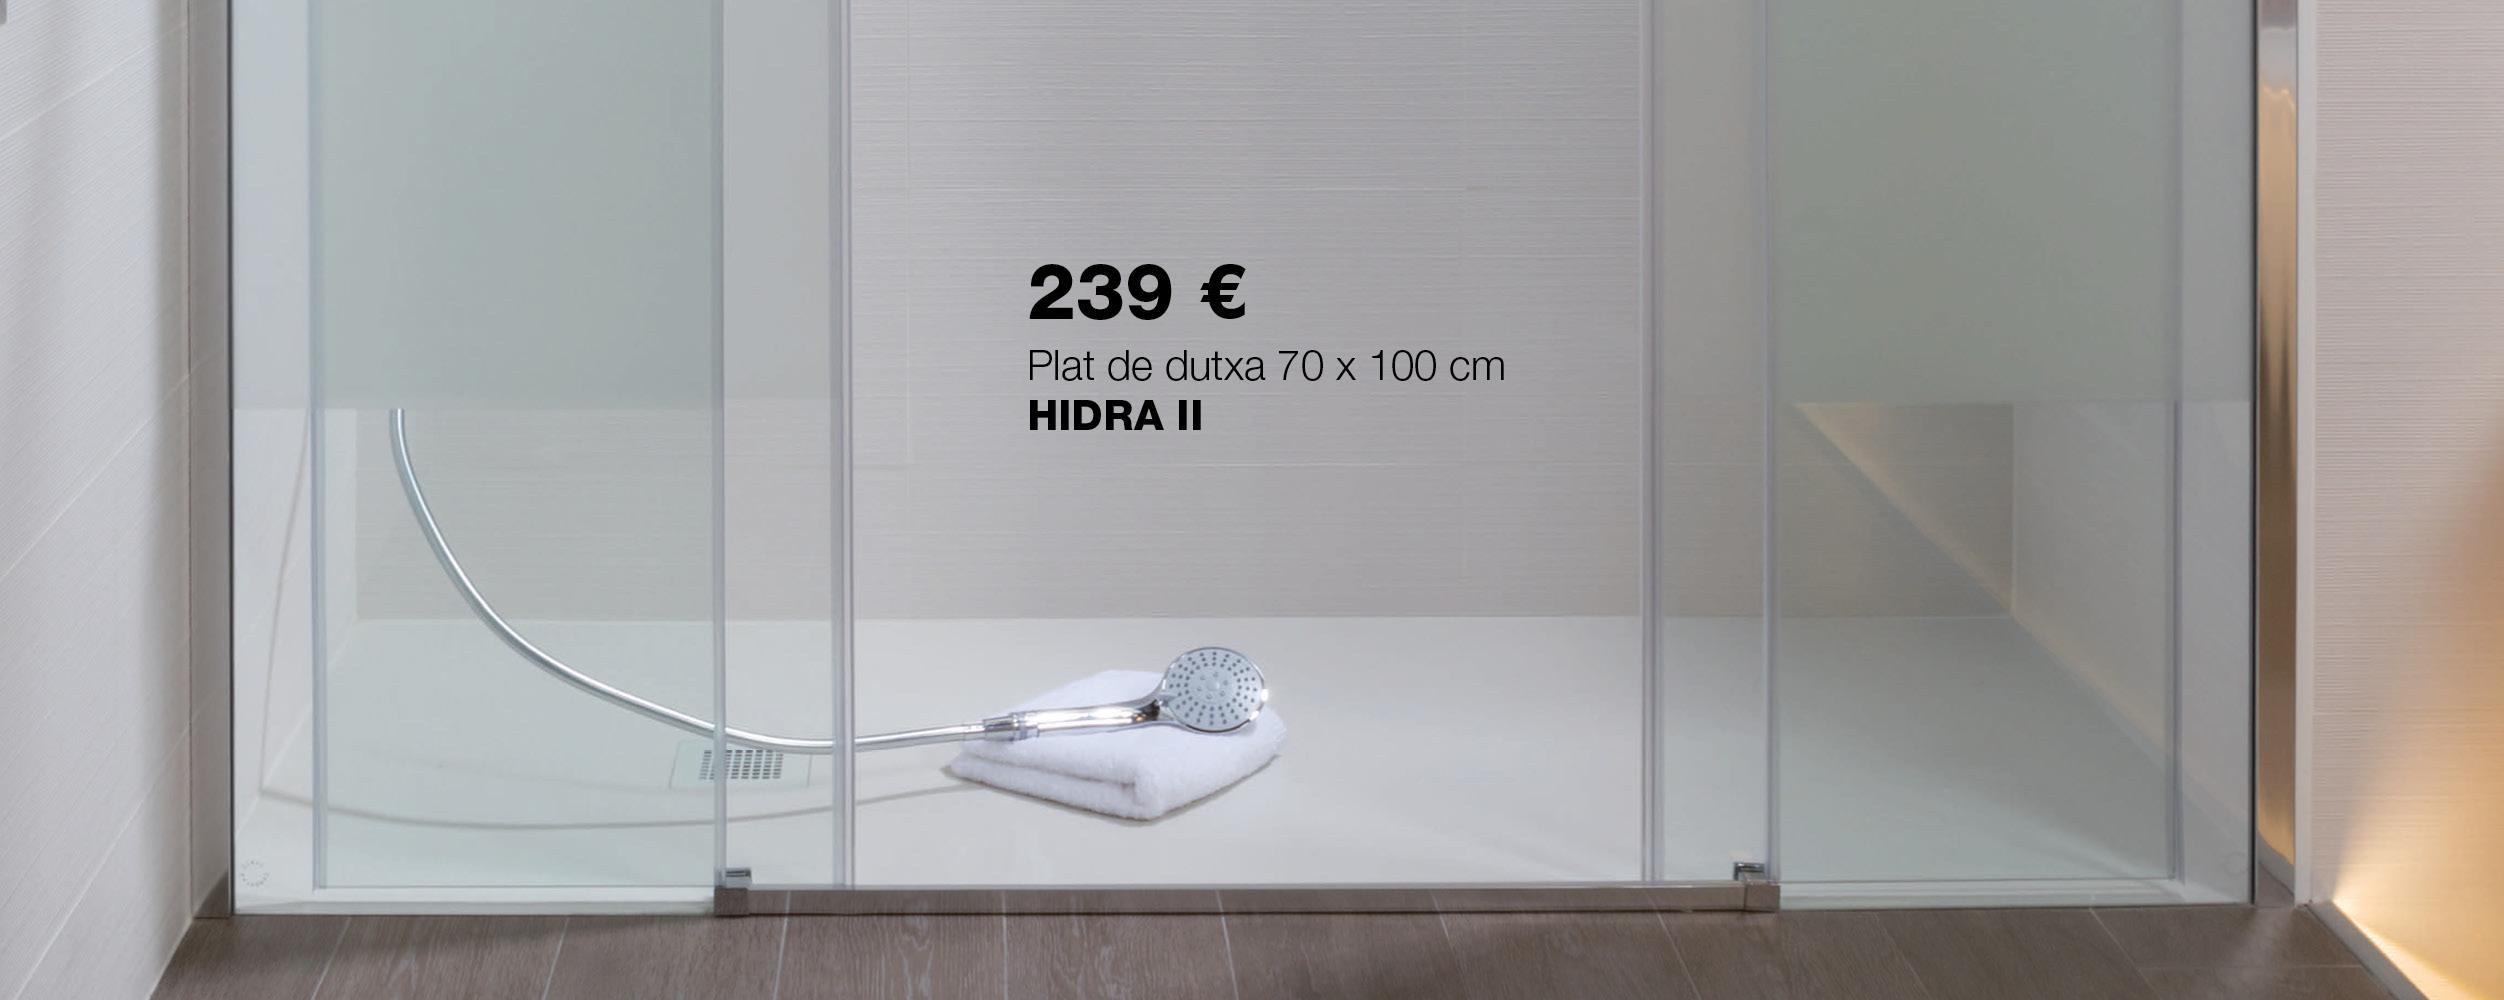 Plat de dutxa HIDRA II